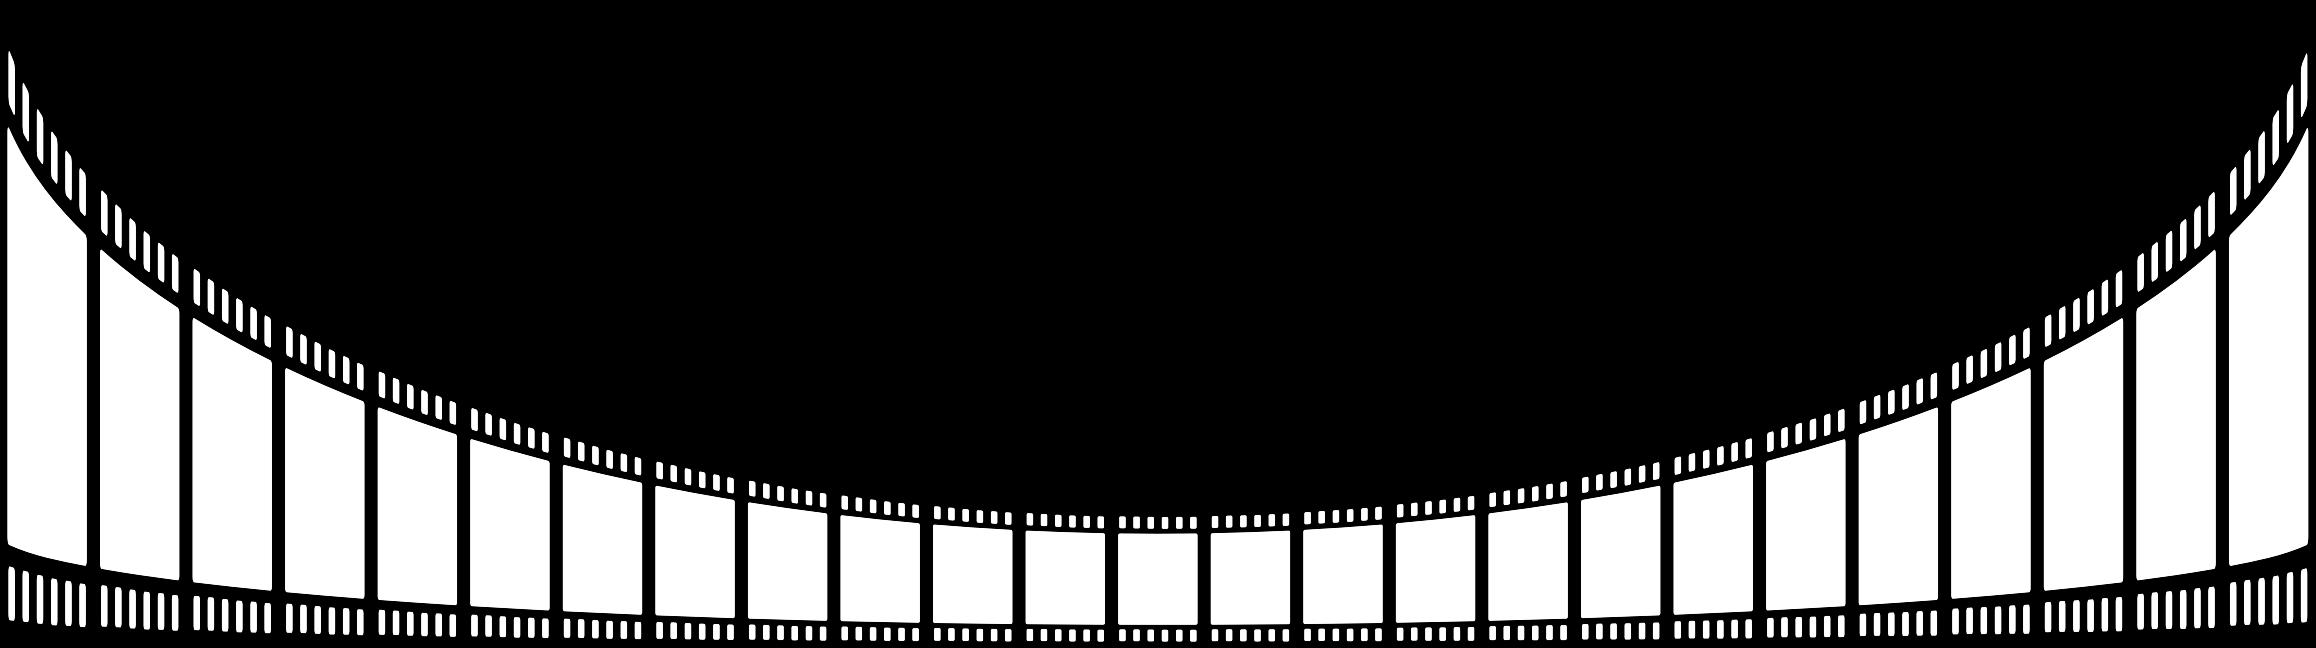 Movie clipart film role. Stip free download best